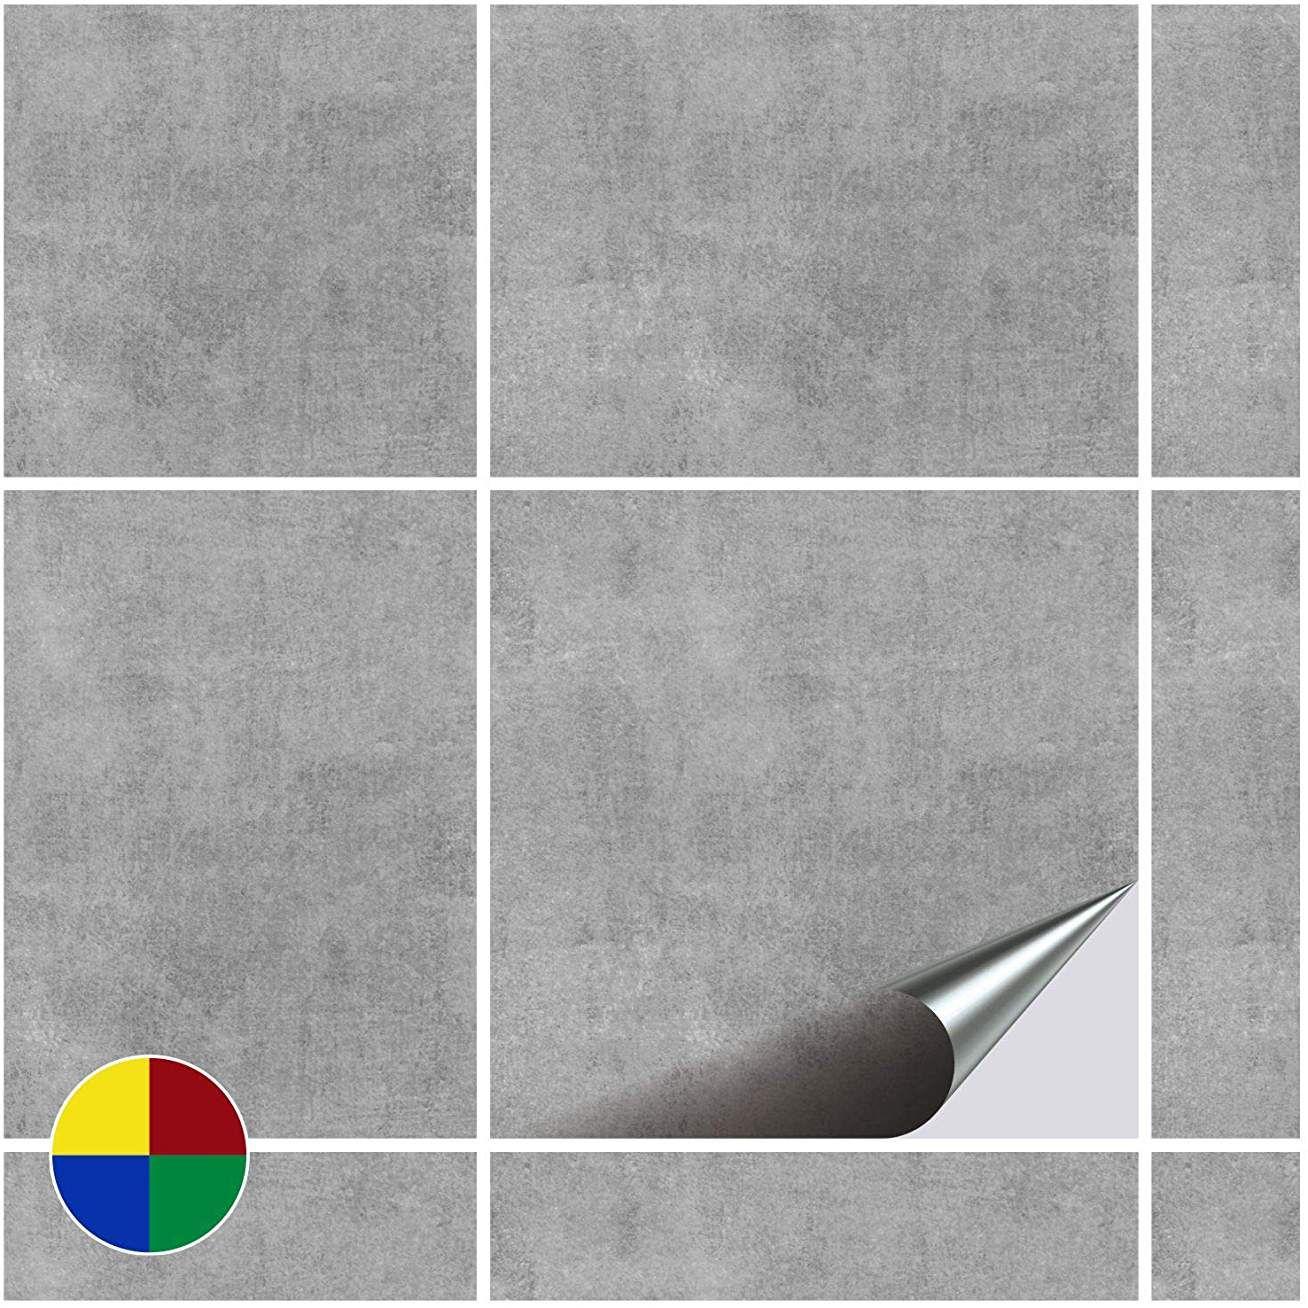 Foliesen 2245020 Stickers Carrelage 15x15 Cm Pvc Decor Greydi